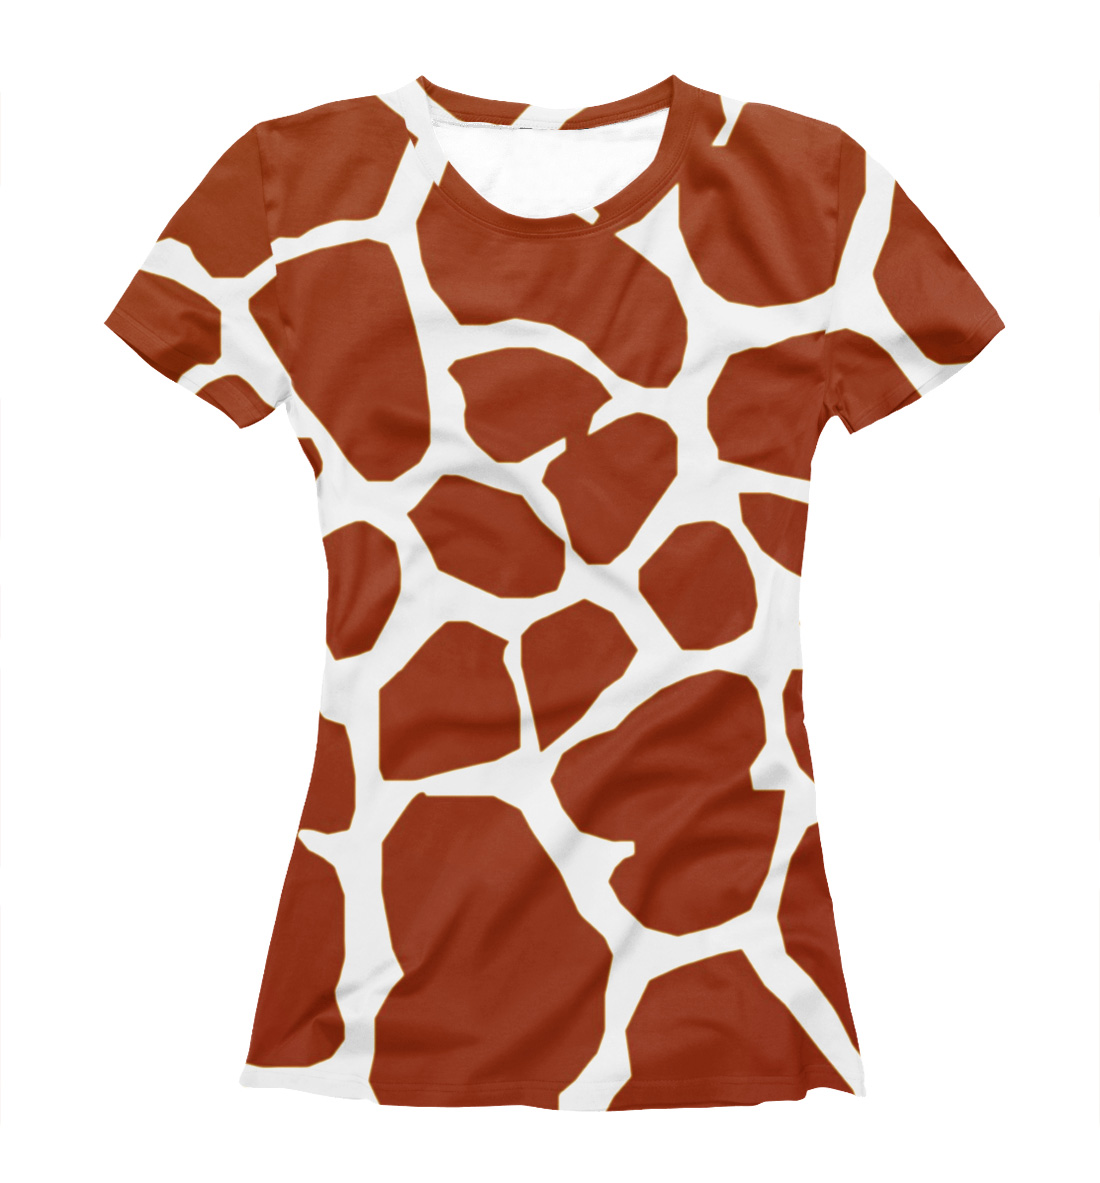 89e45873 Giraffe Skin Texture Women's T-shirt – Quantum Boutique